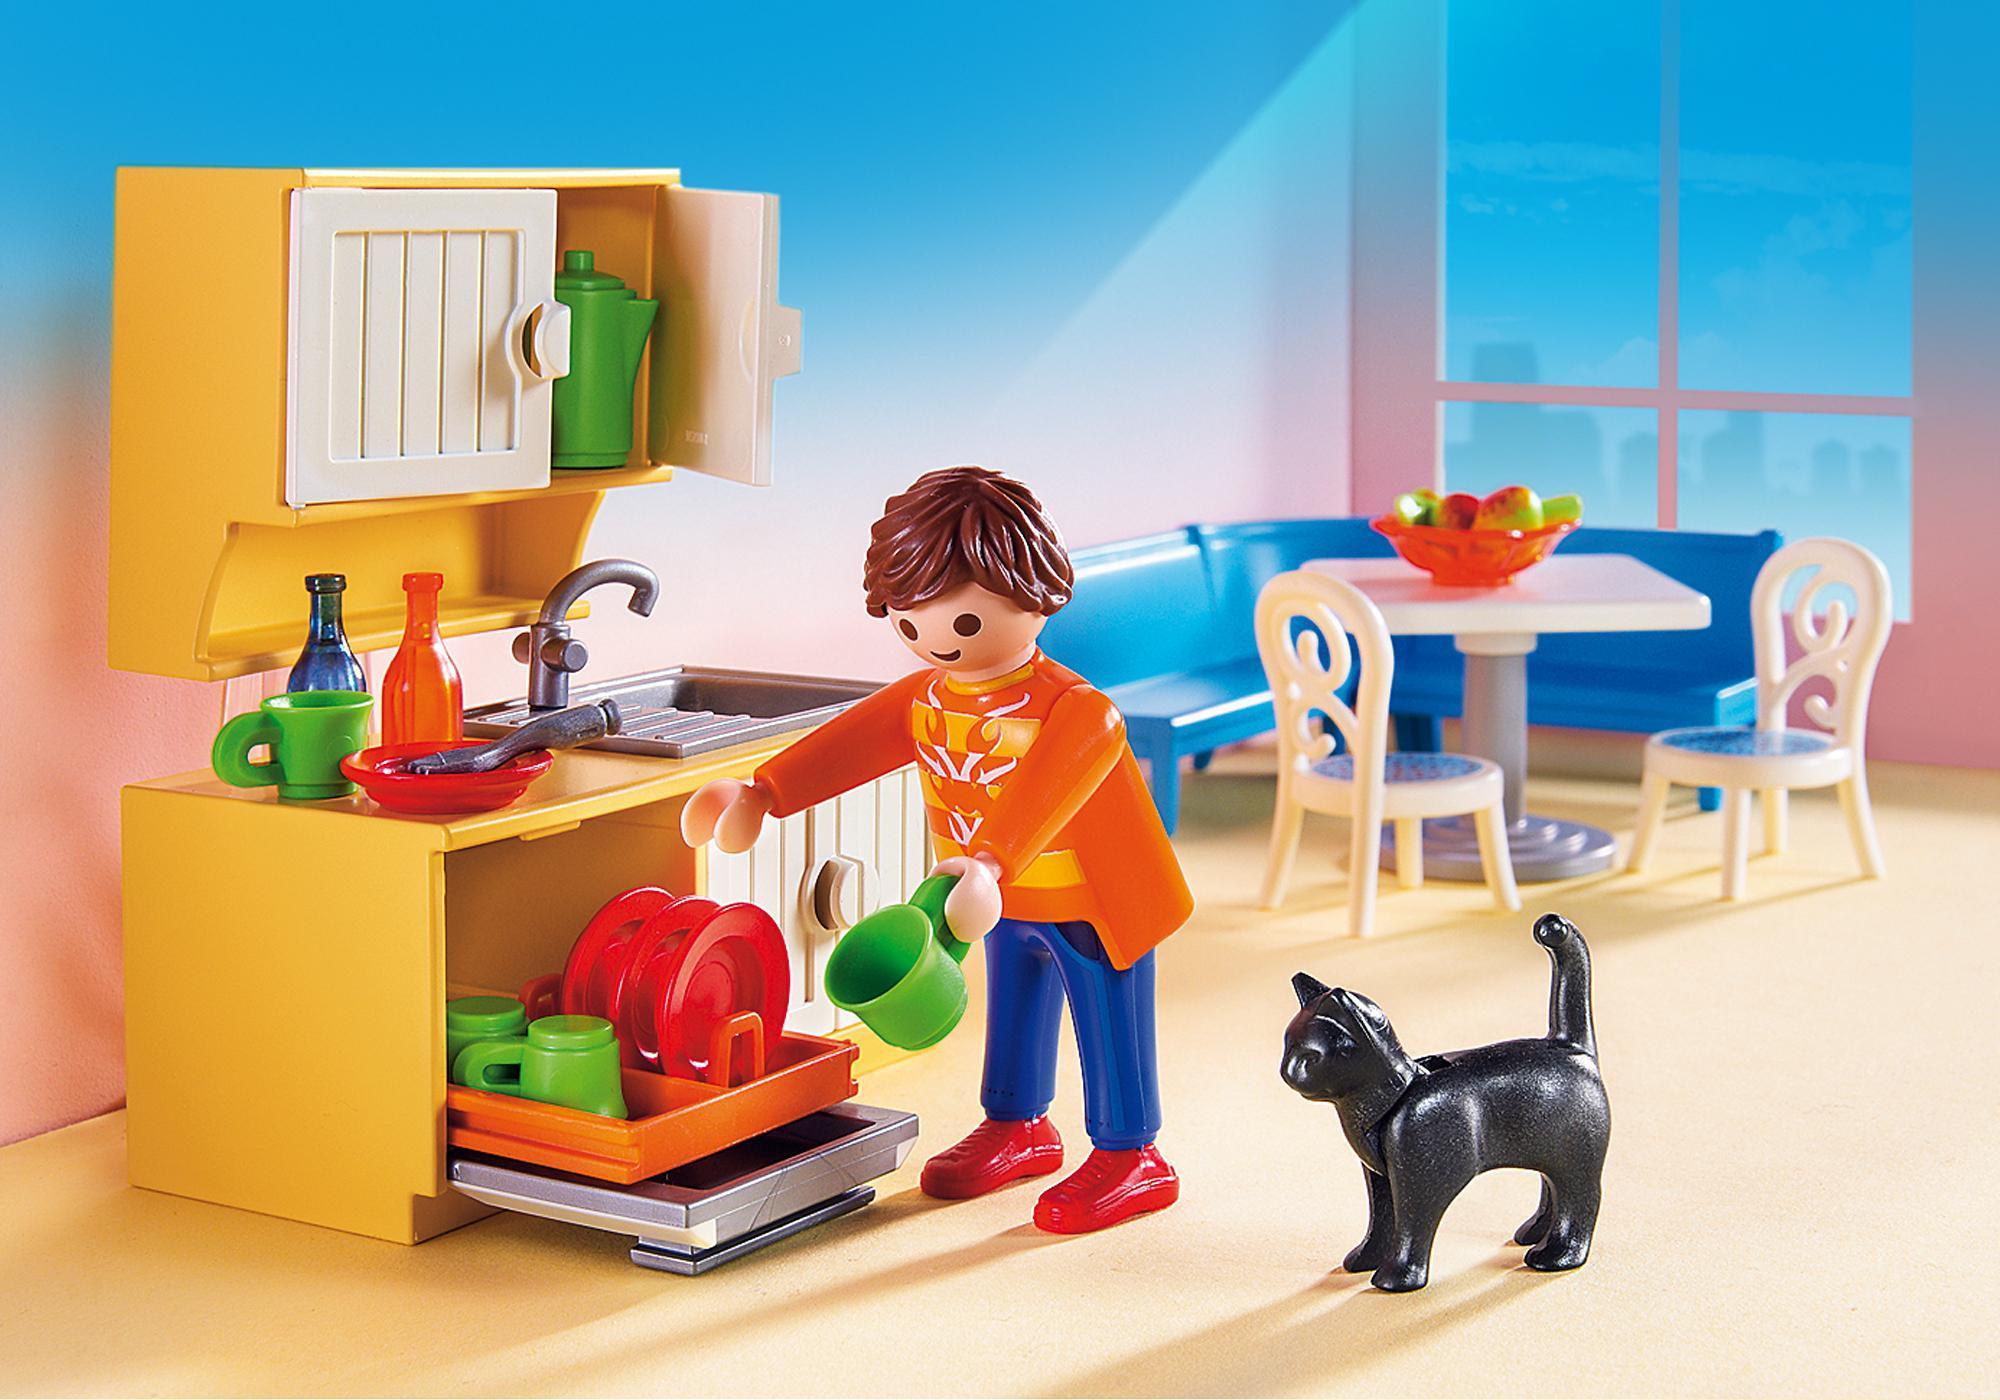 http://media.playmobil.com/i/playmobil/5336_product_extra1/Cocina